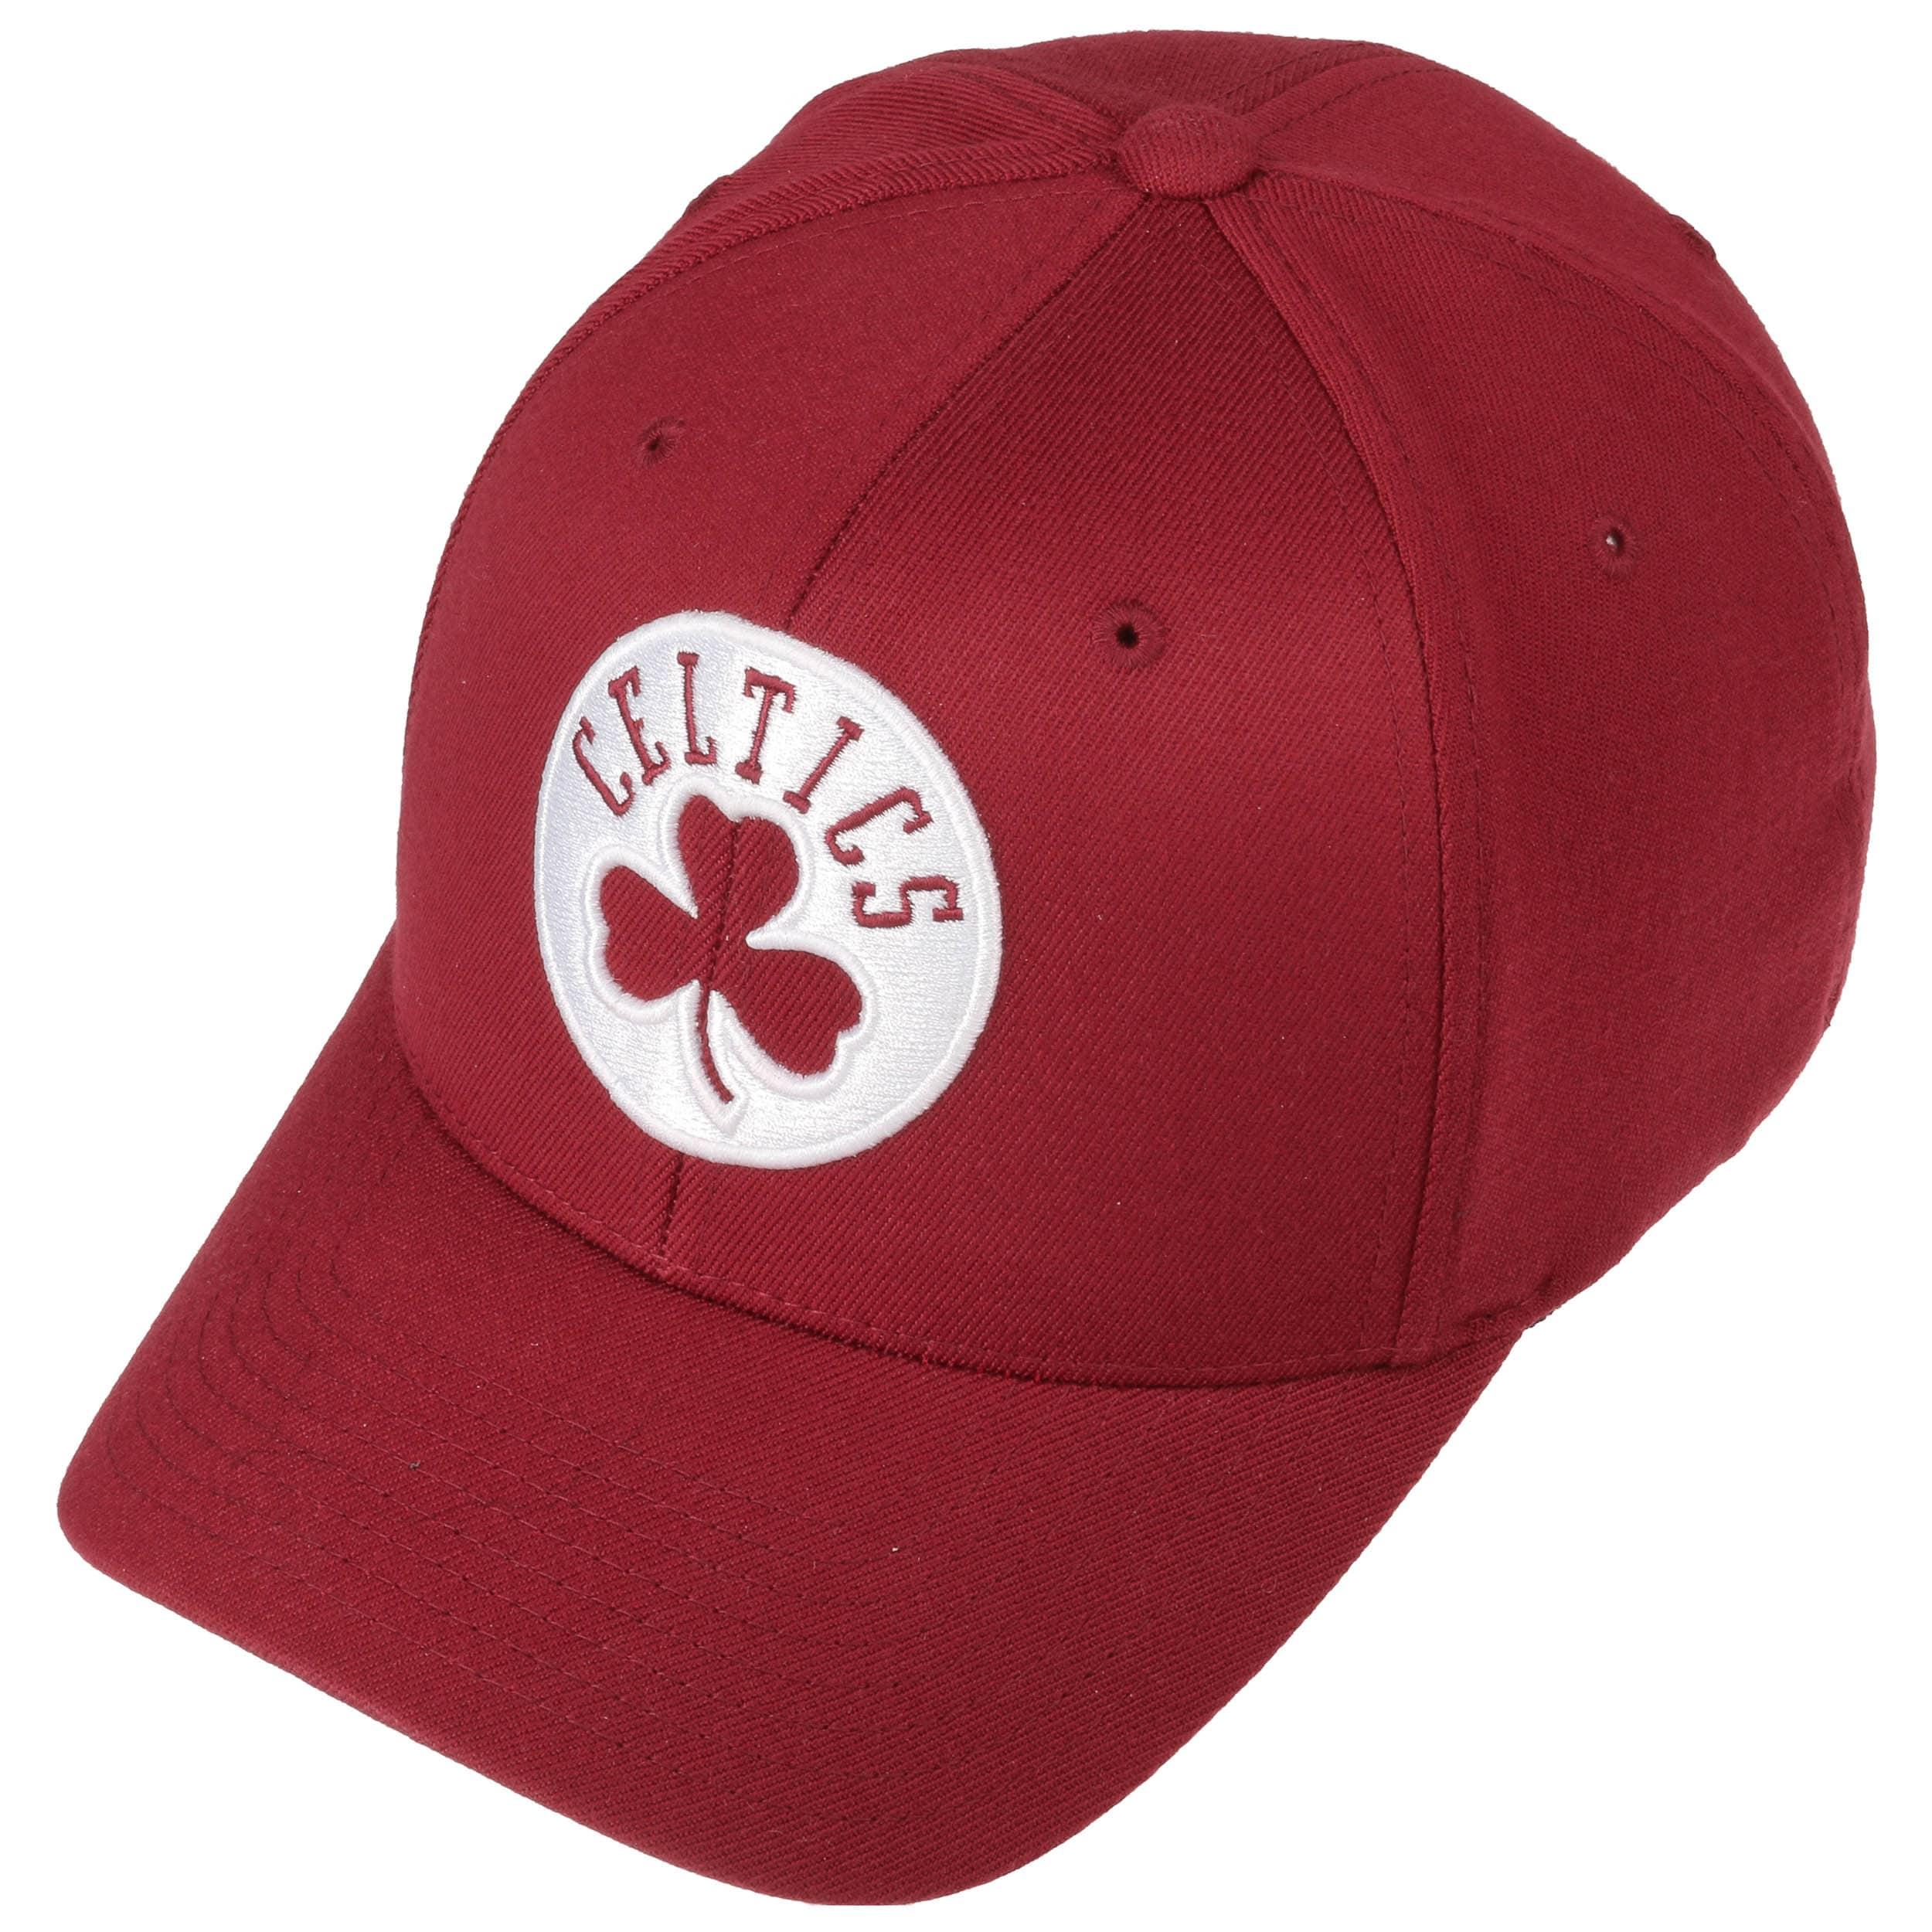 110 Burgundy Celtics Cap by Mitchell   Ness - bordeaux 1 ... 52b2187348e